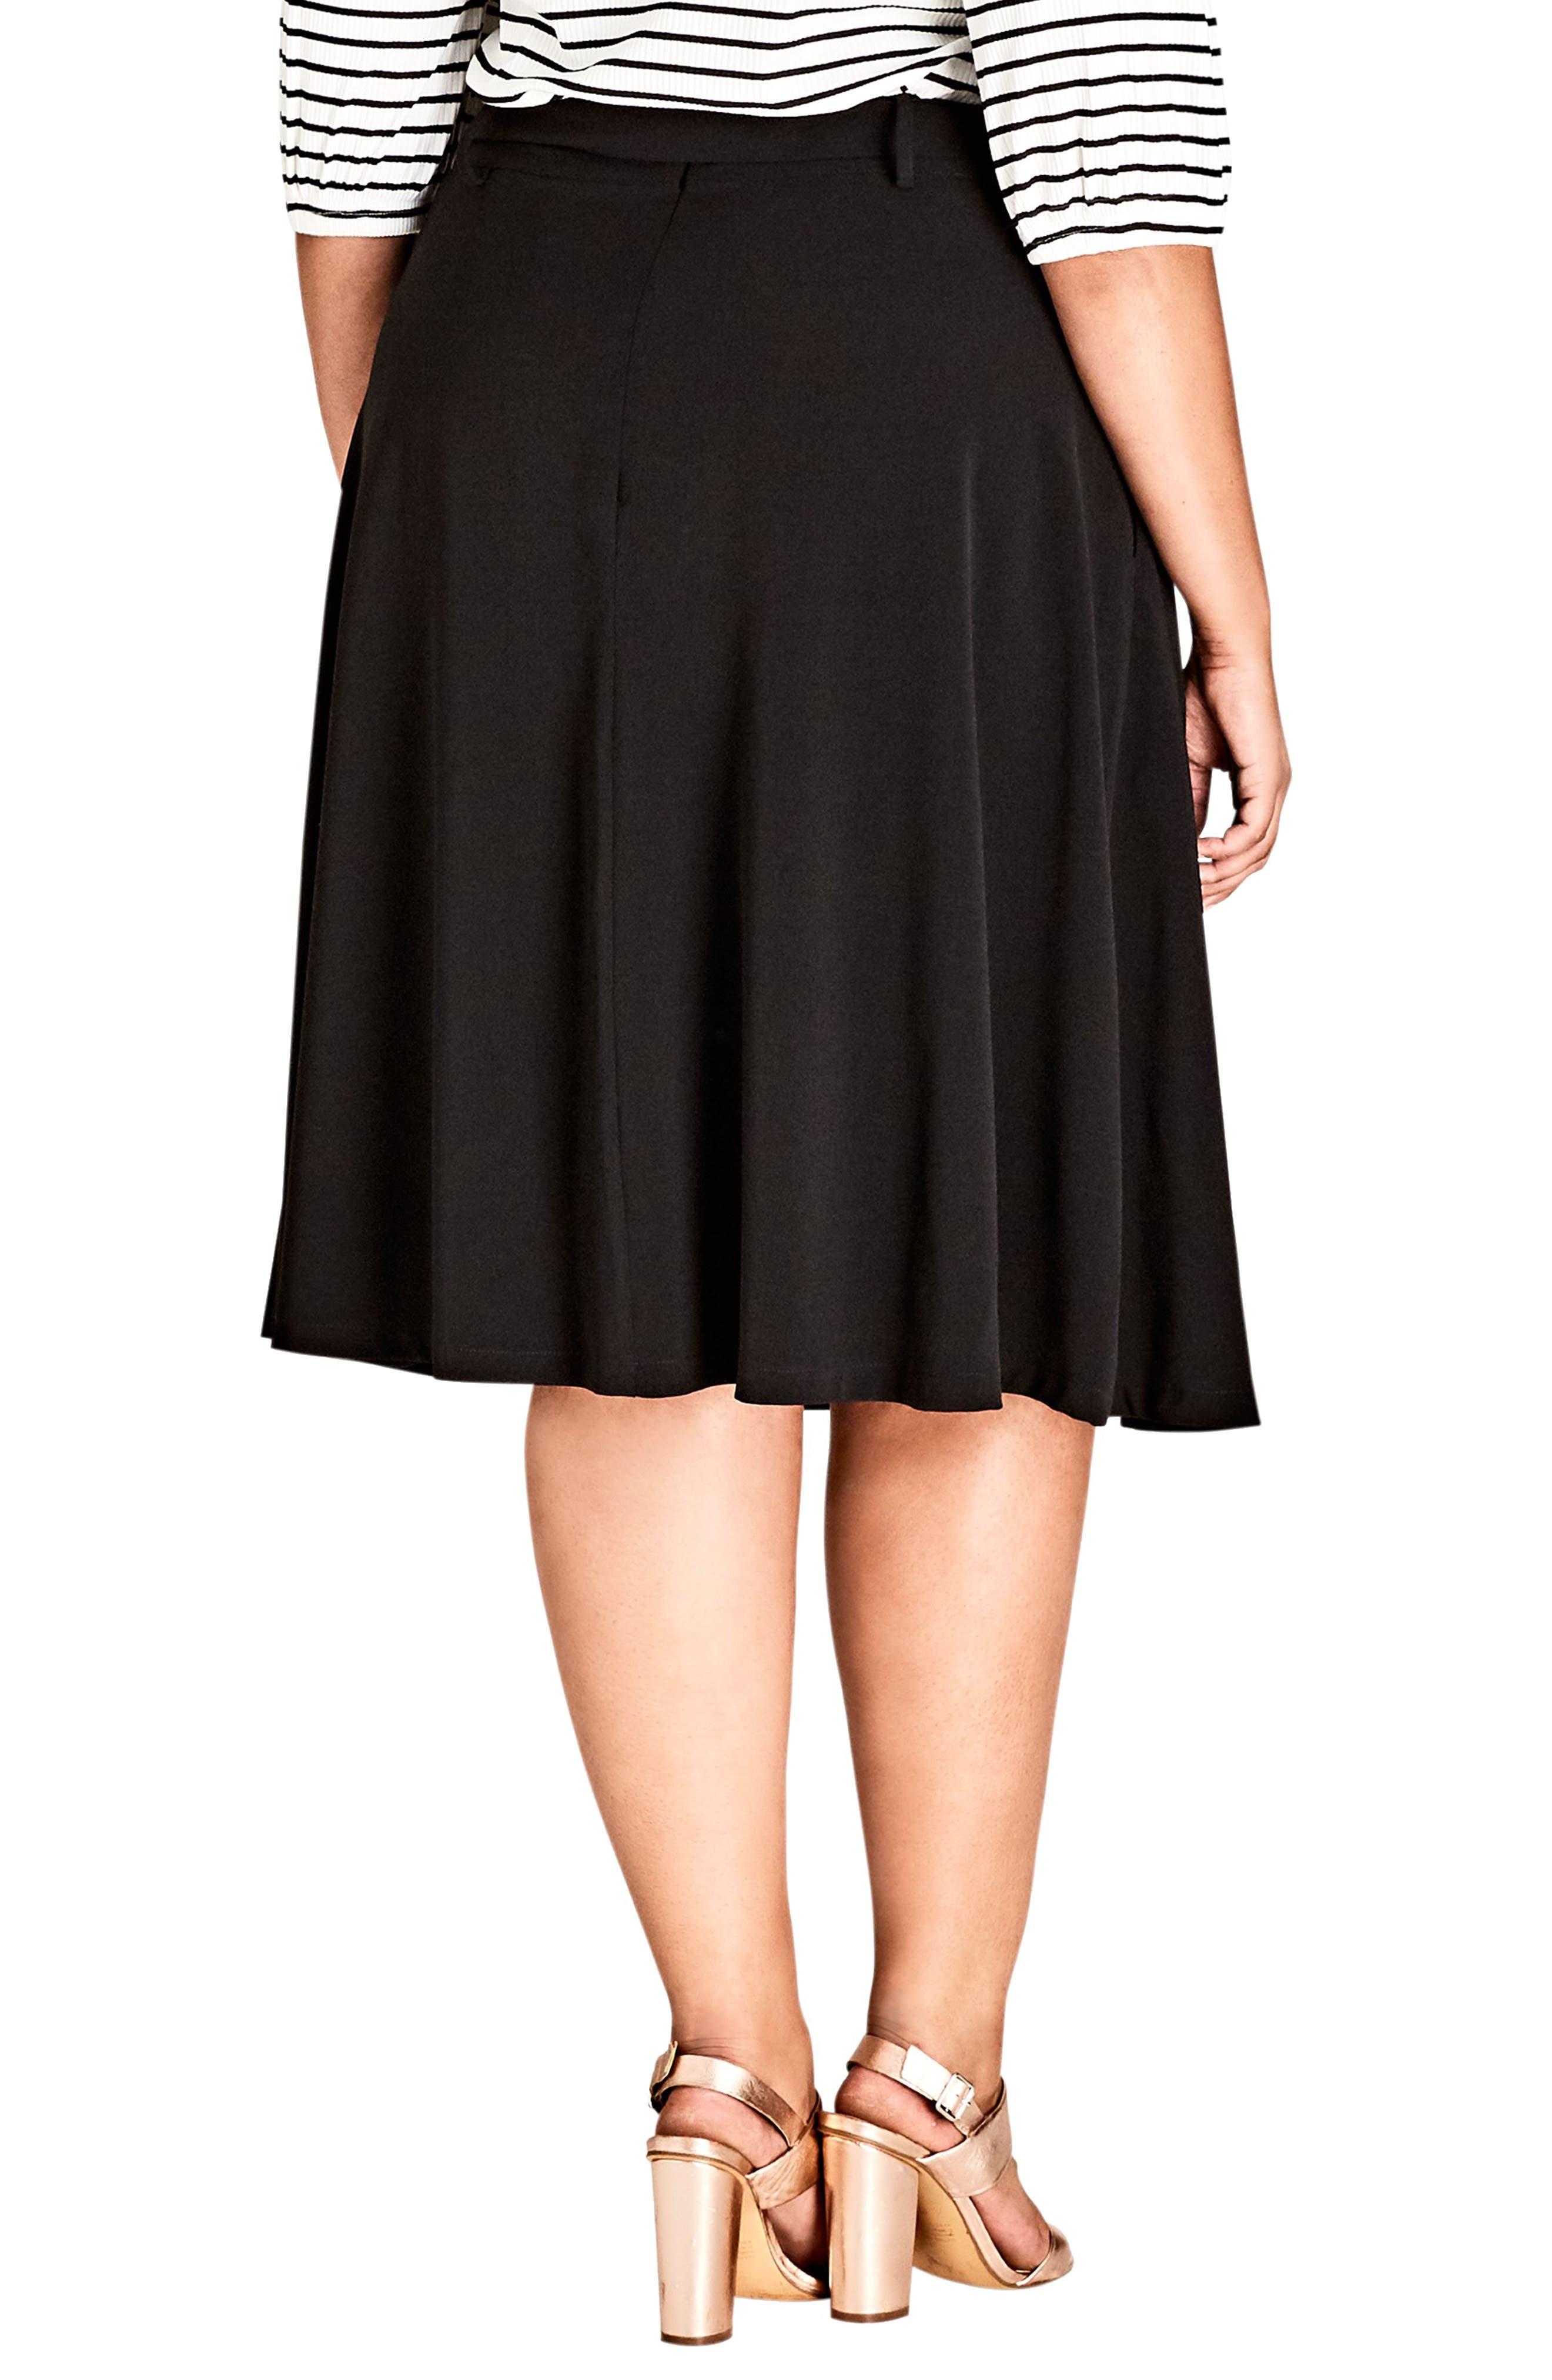 Joyful A-Line Skirt,                             Alternate thumbnail 2, color,                             BLACK